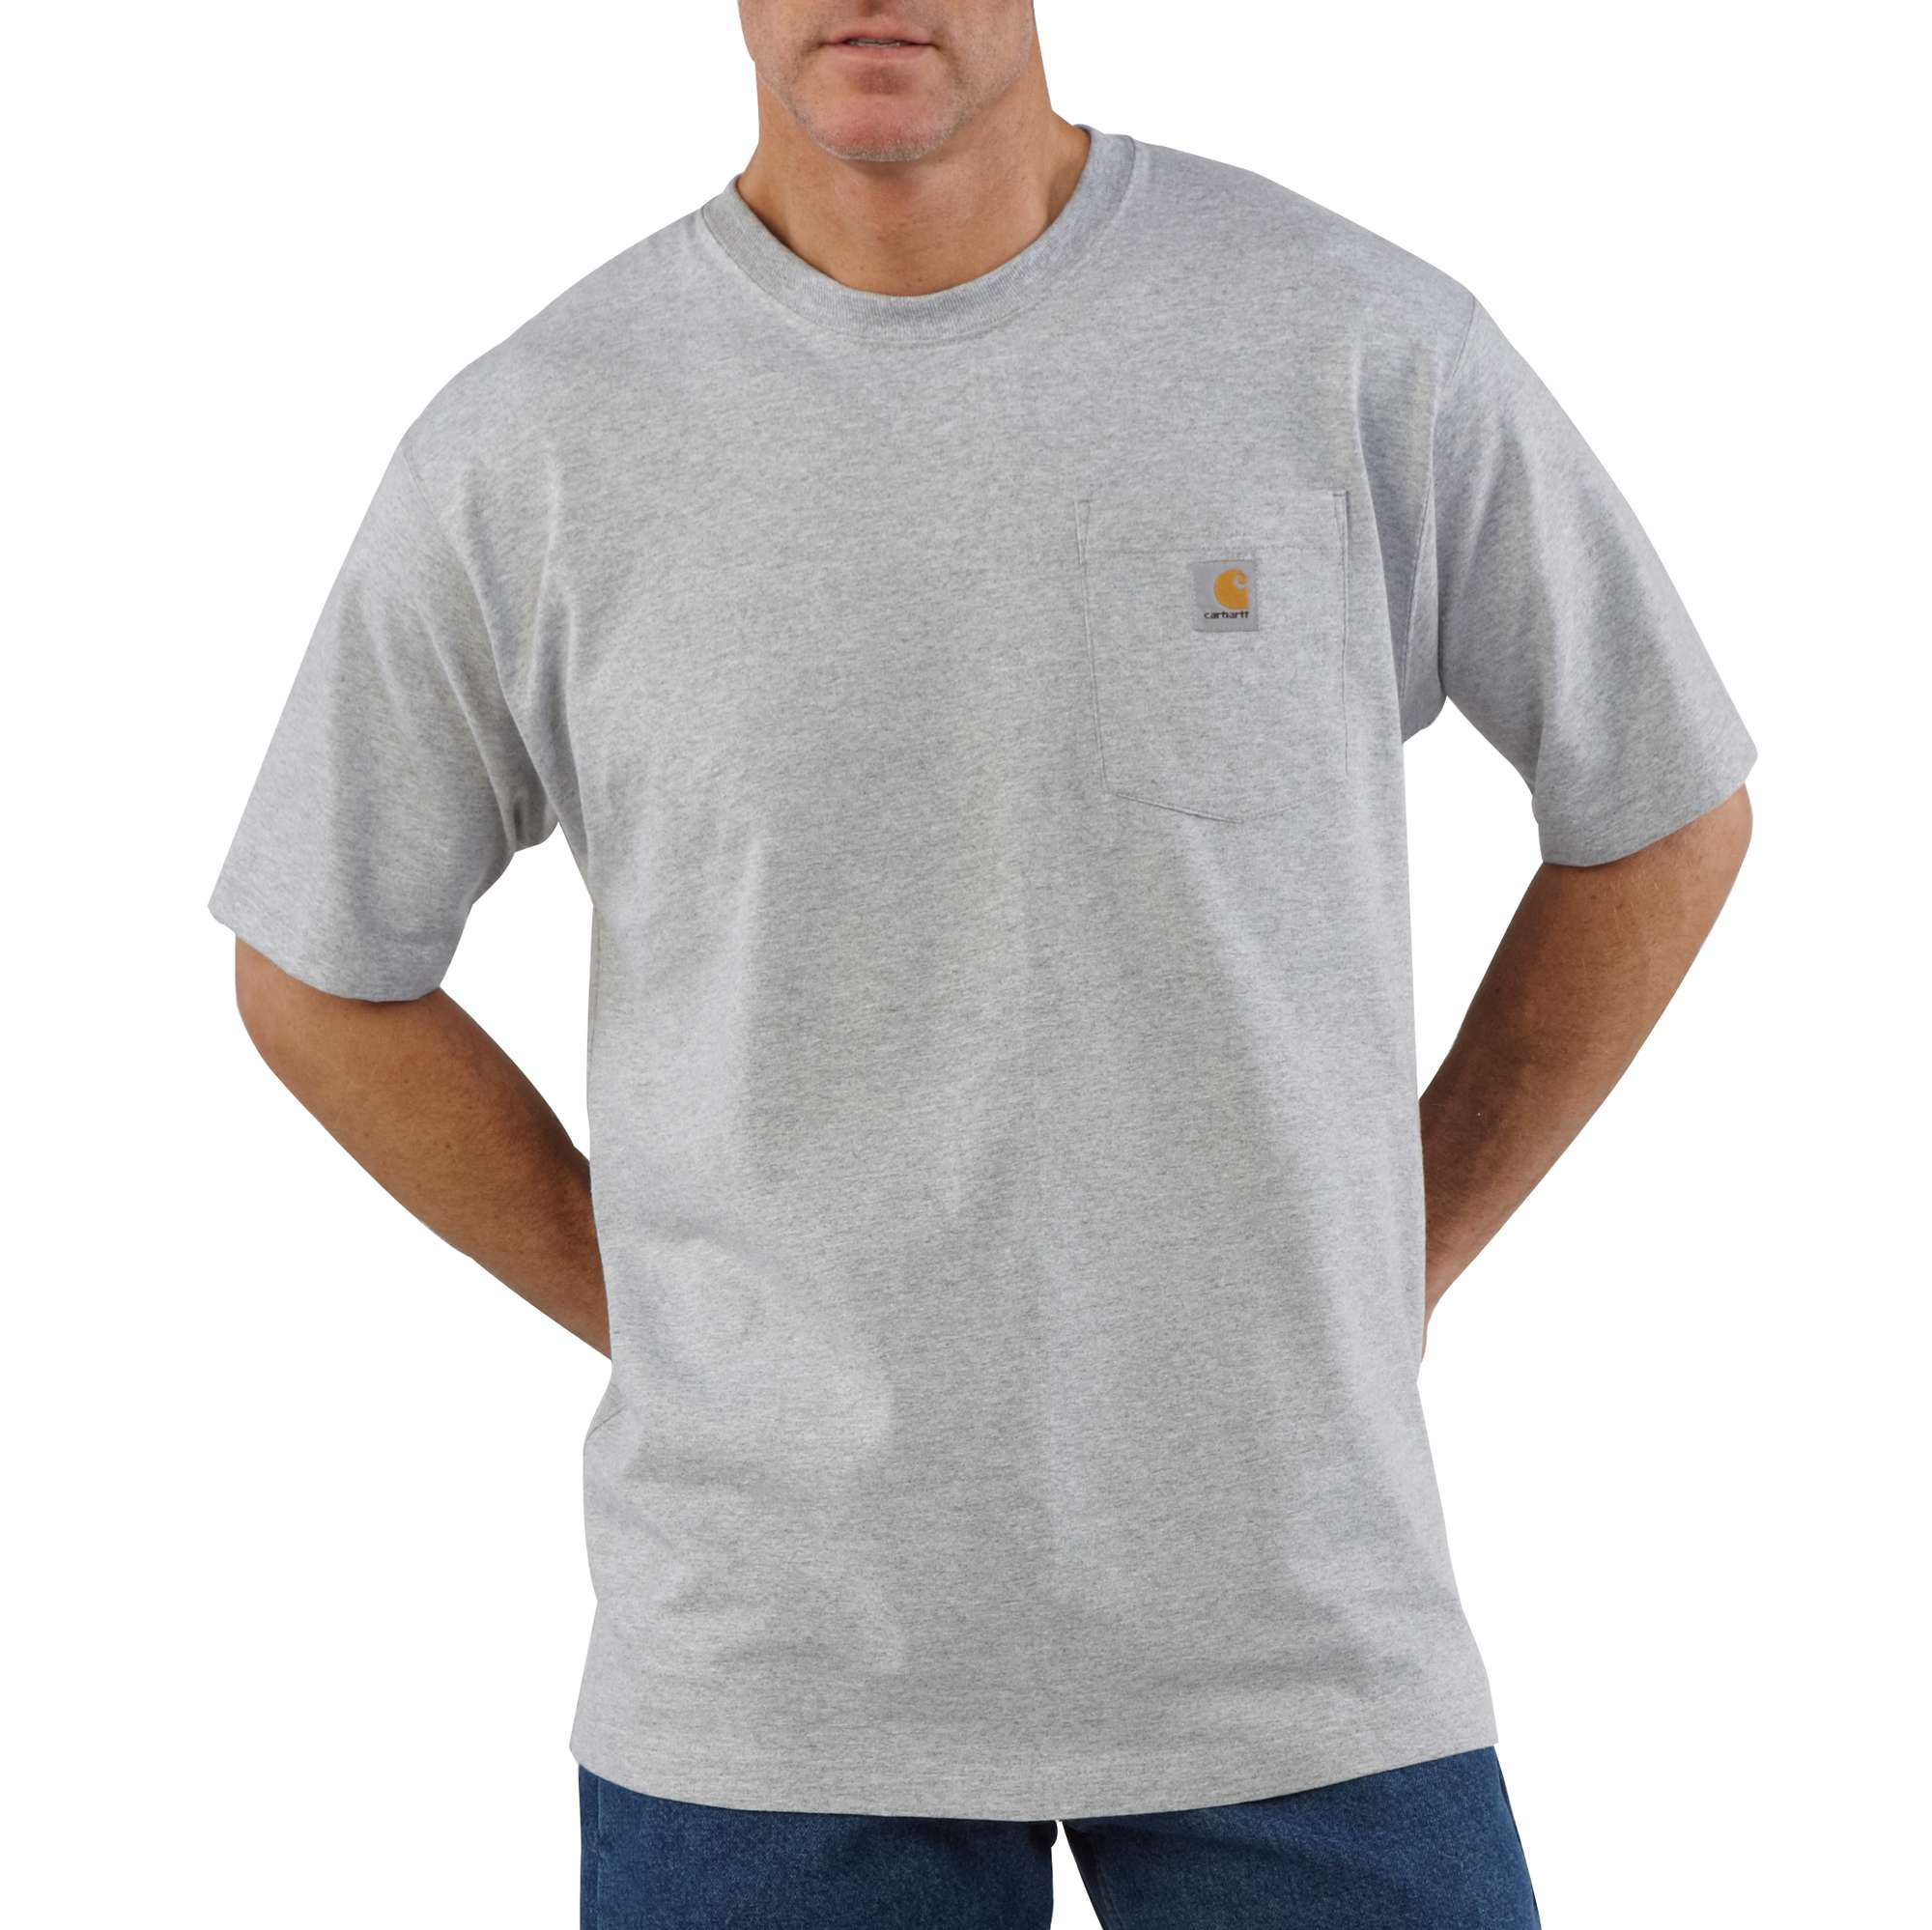 Men's Workwear Pocket T-shirt, Dark Gray,Pewter,Slate, swatch